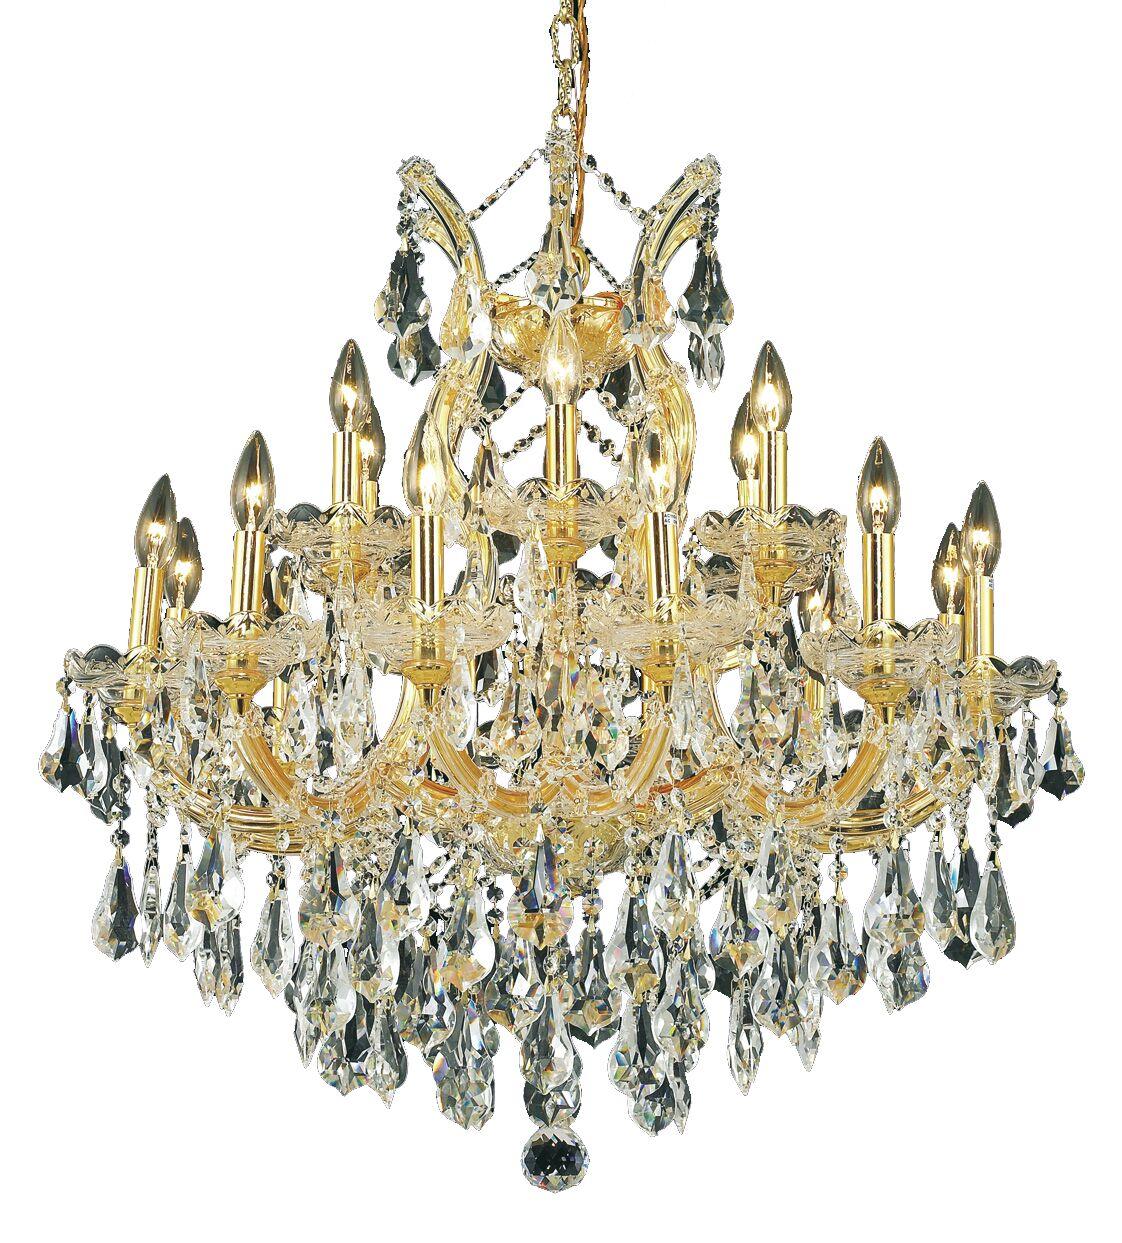 Regina 19-Light Chain Candle Style Chandelier Finish / Crystal Finish / Crystal Trim: Gold / Golden Teak (Smoky) / Strass Swarovski